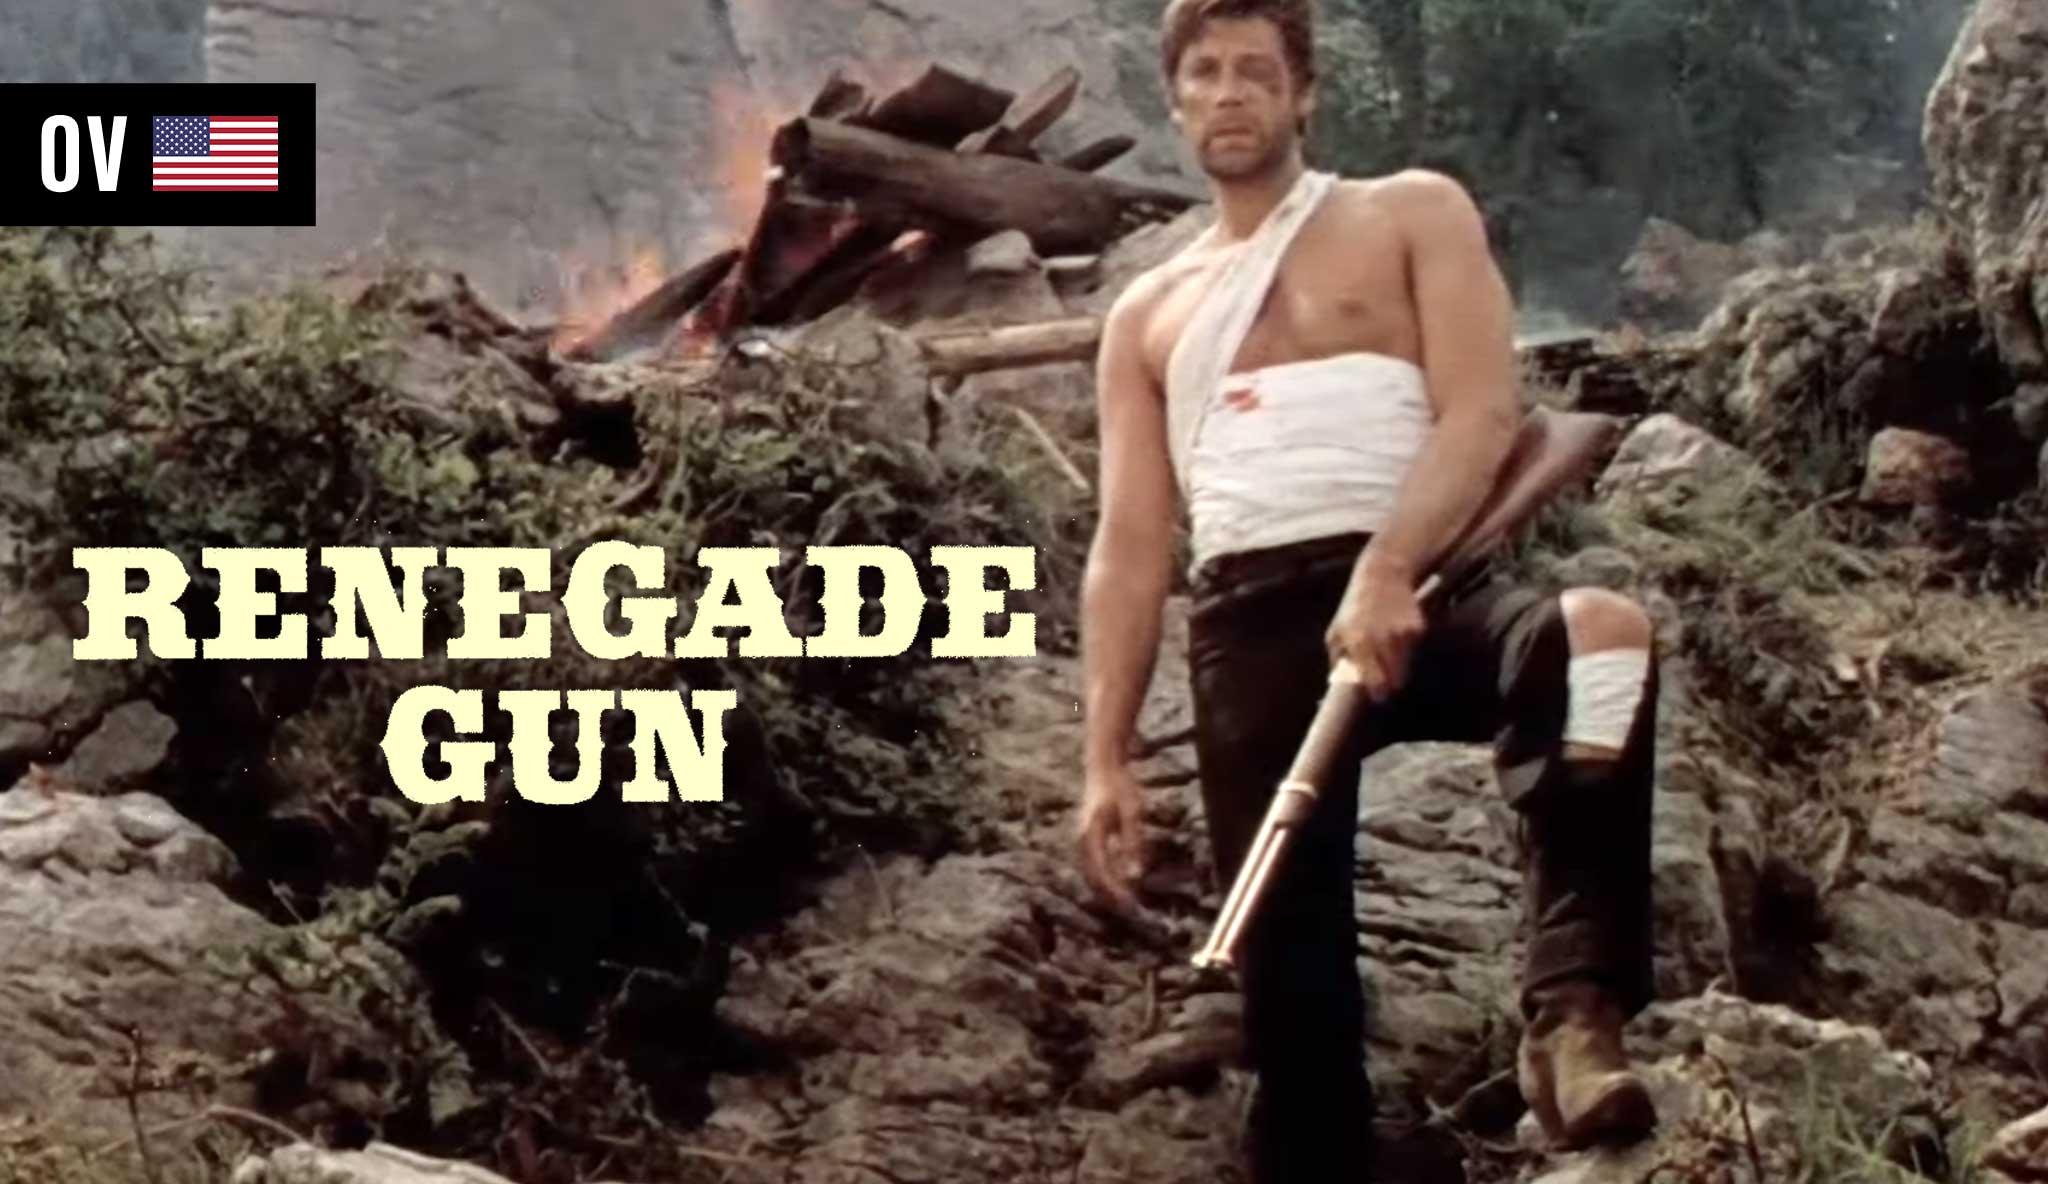 renegade-gun\header.jpg